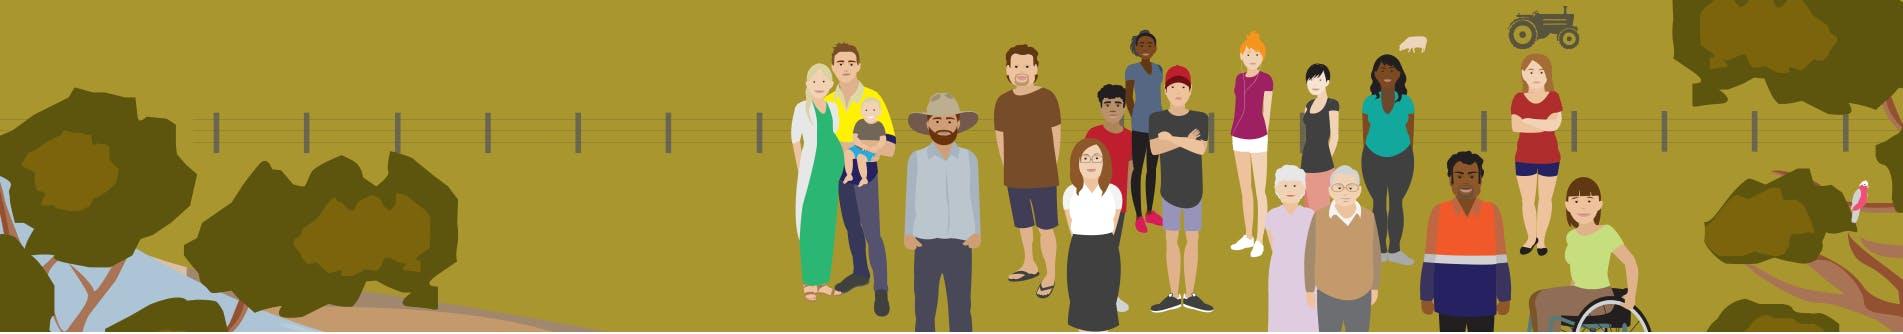 Graphic image of various community members